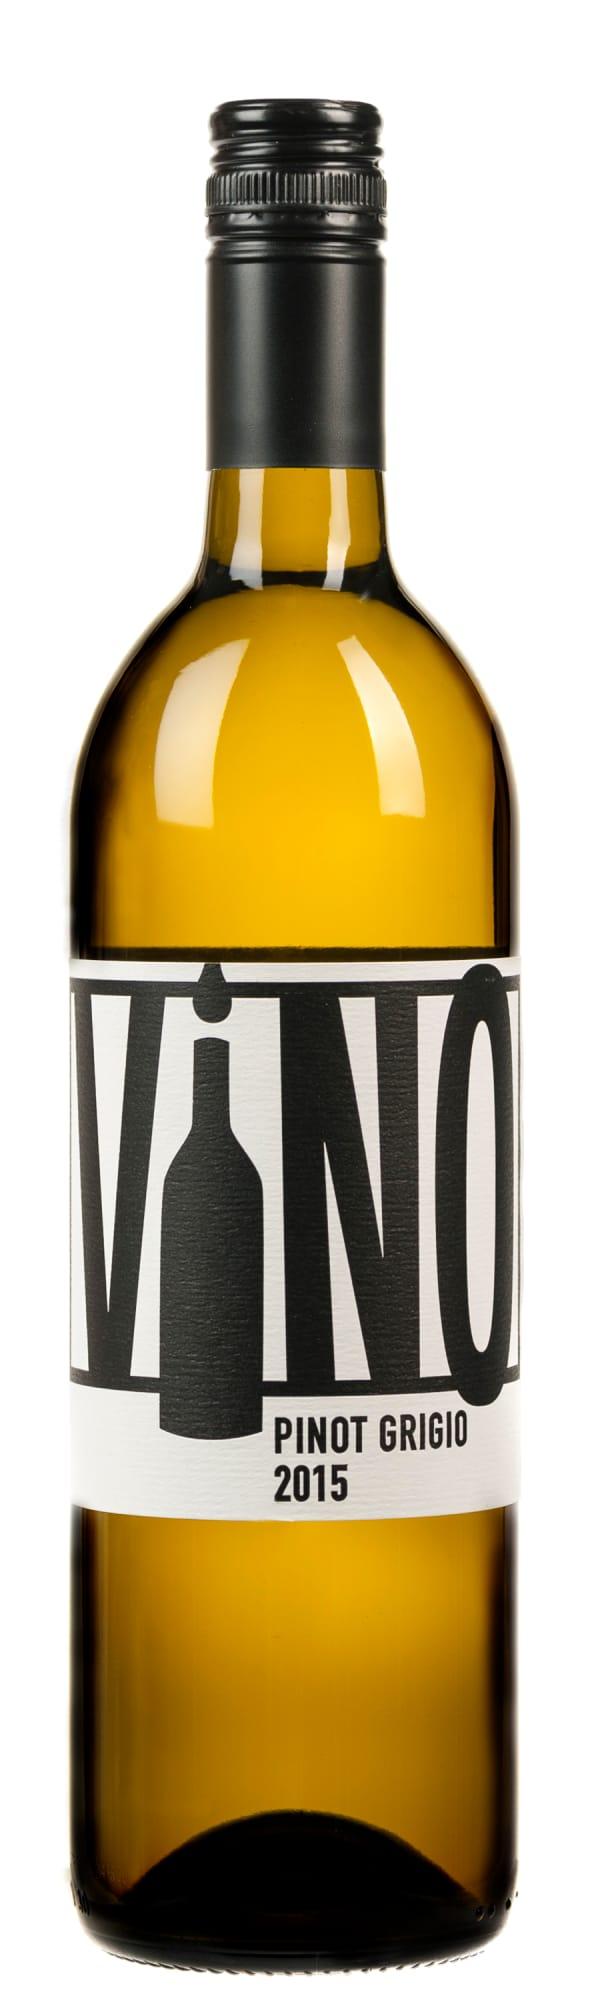 Vino Pinot Grigio by Charles Smith 2015